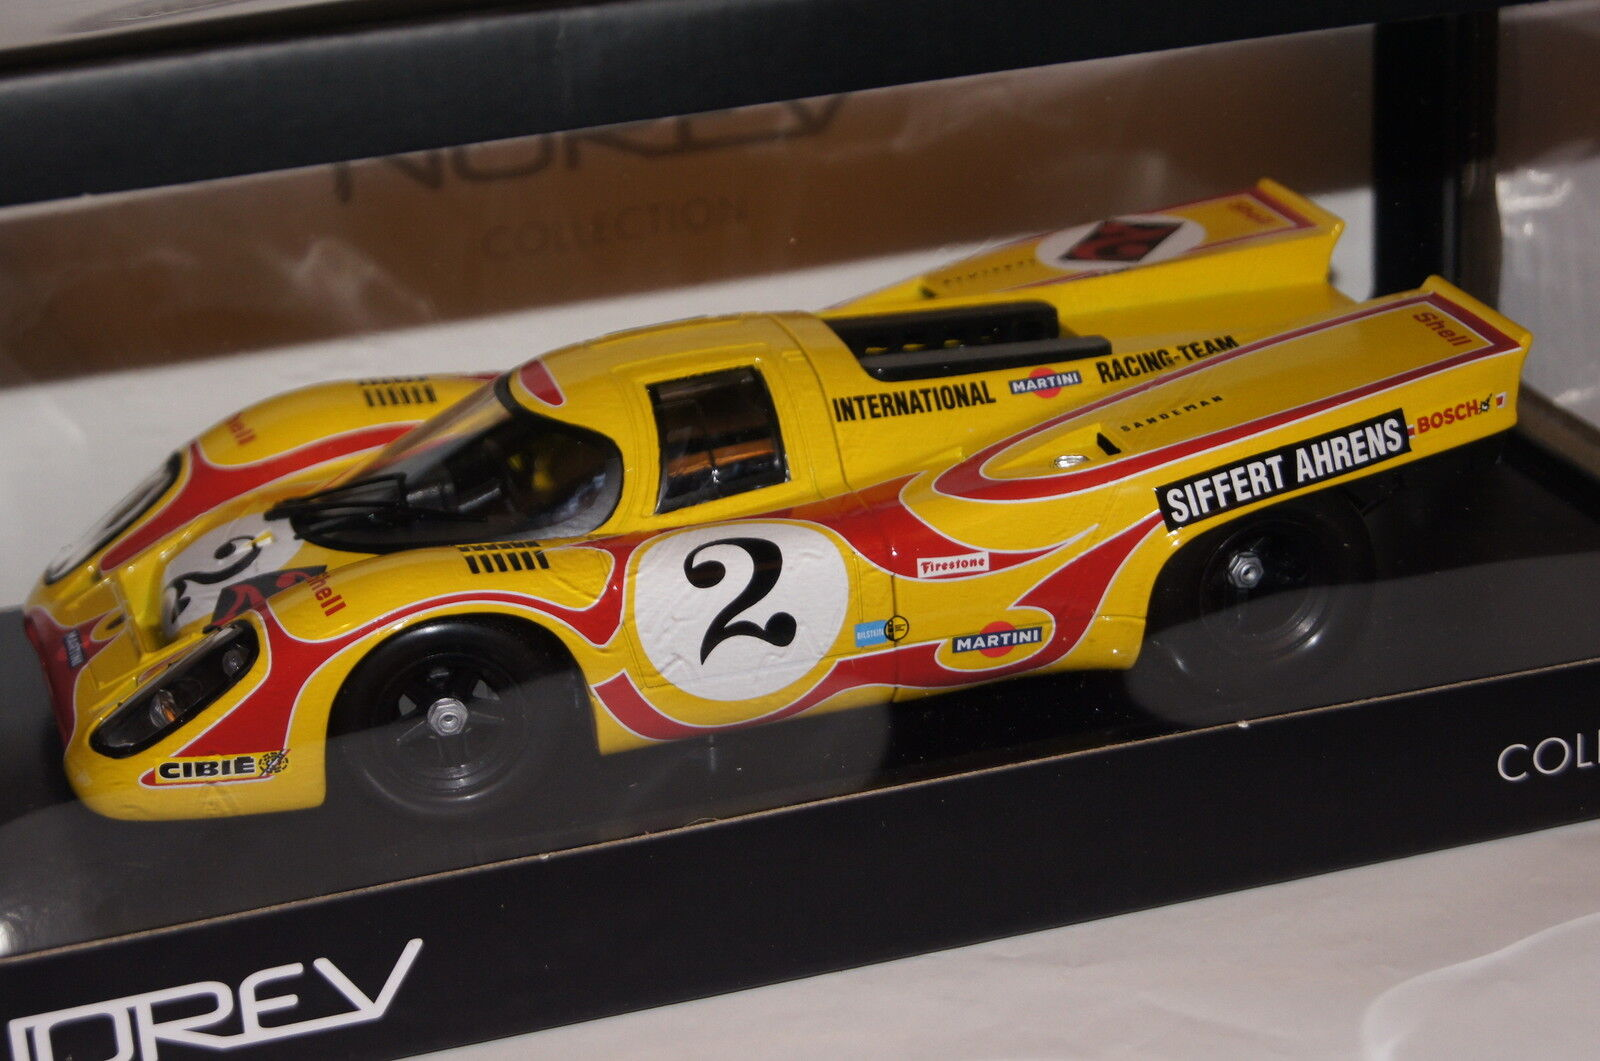 Porsche 917k  2 9h Kyalami 1970 siffert Ahrens 1 18 NOREV NOUVEAU & OVP 187581